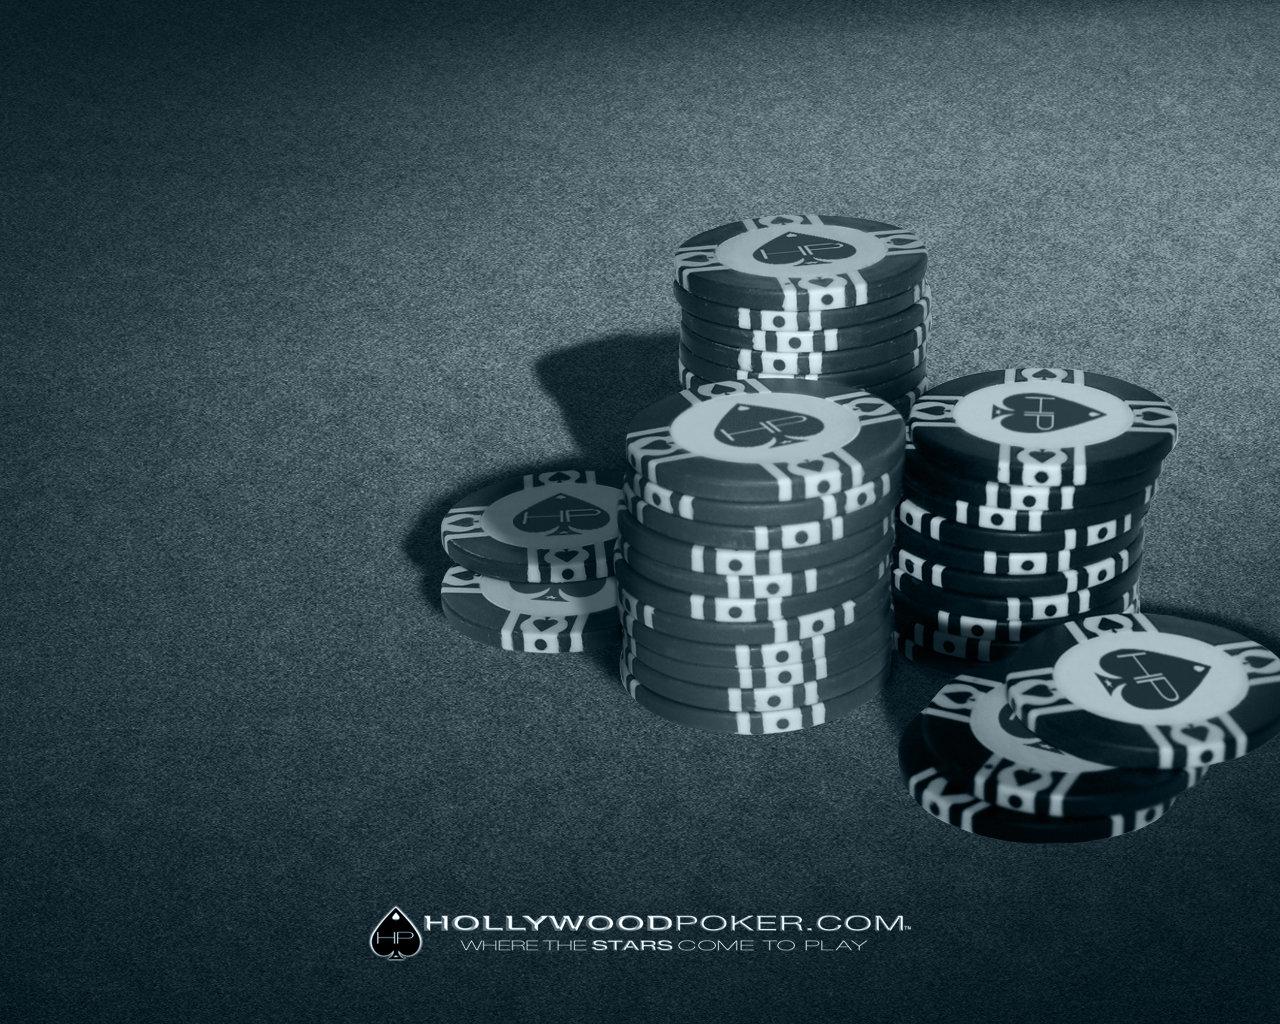 America's Leading 5 U.S.A. Online Casino Poker Sites